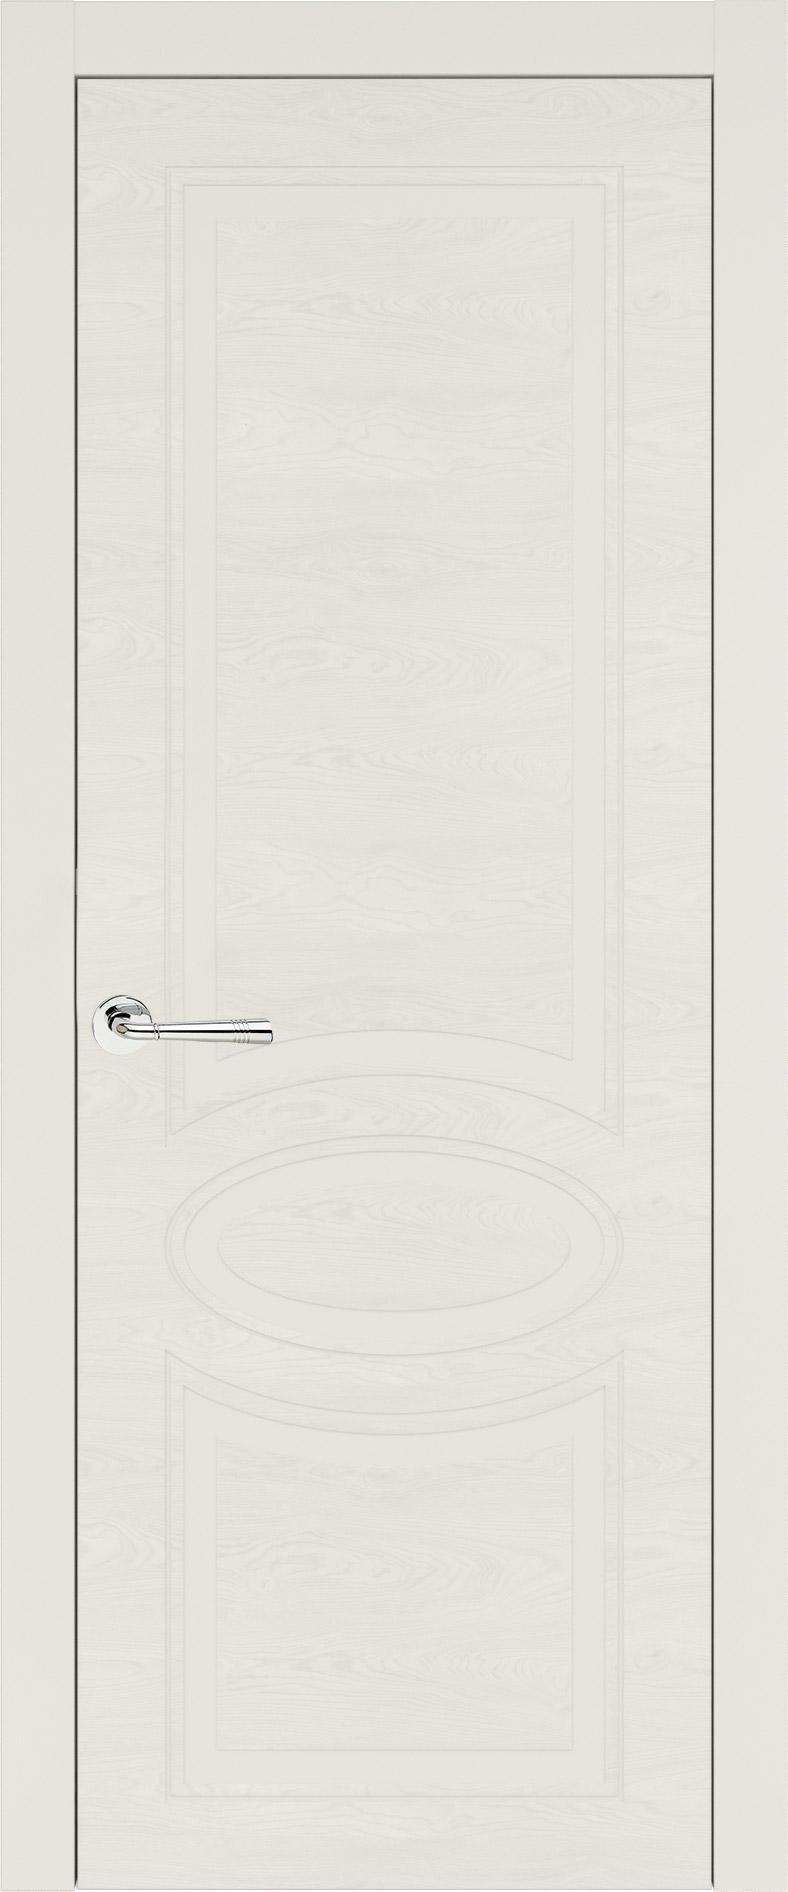 Florencia Neo Classic цвет - Бежевая эмаль по шпону (RAL 9010) Без стекла (ДГ)